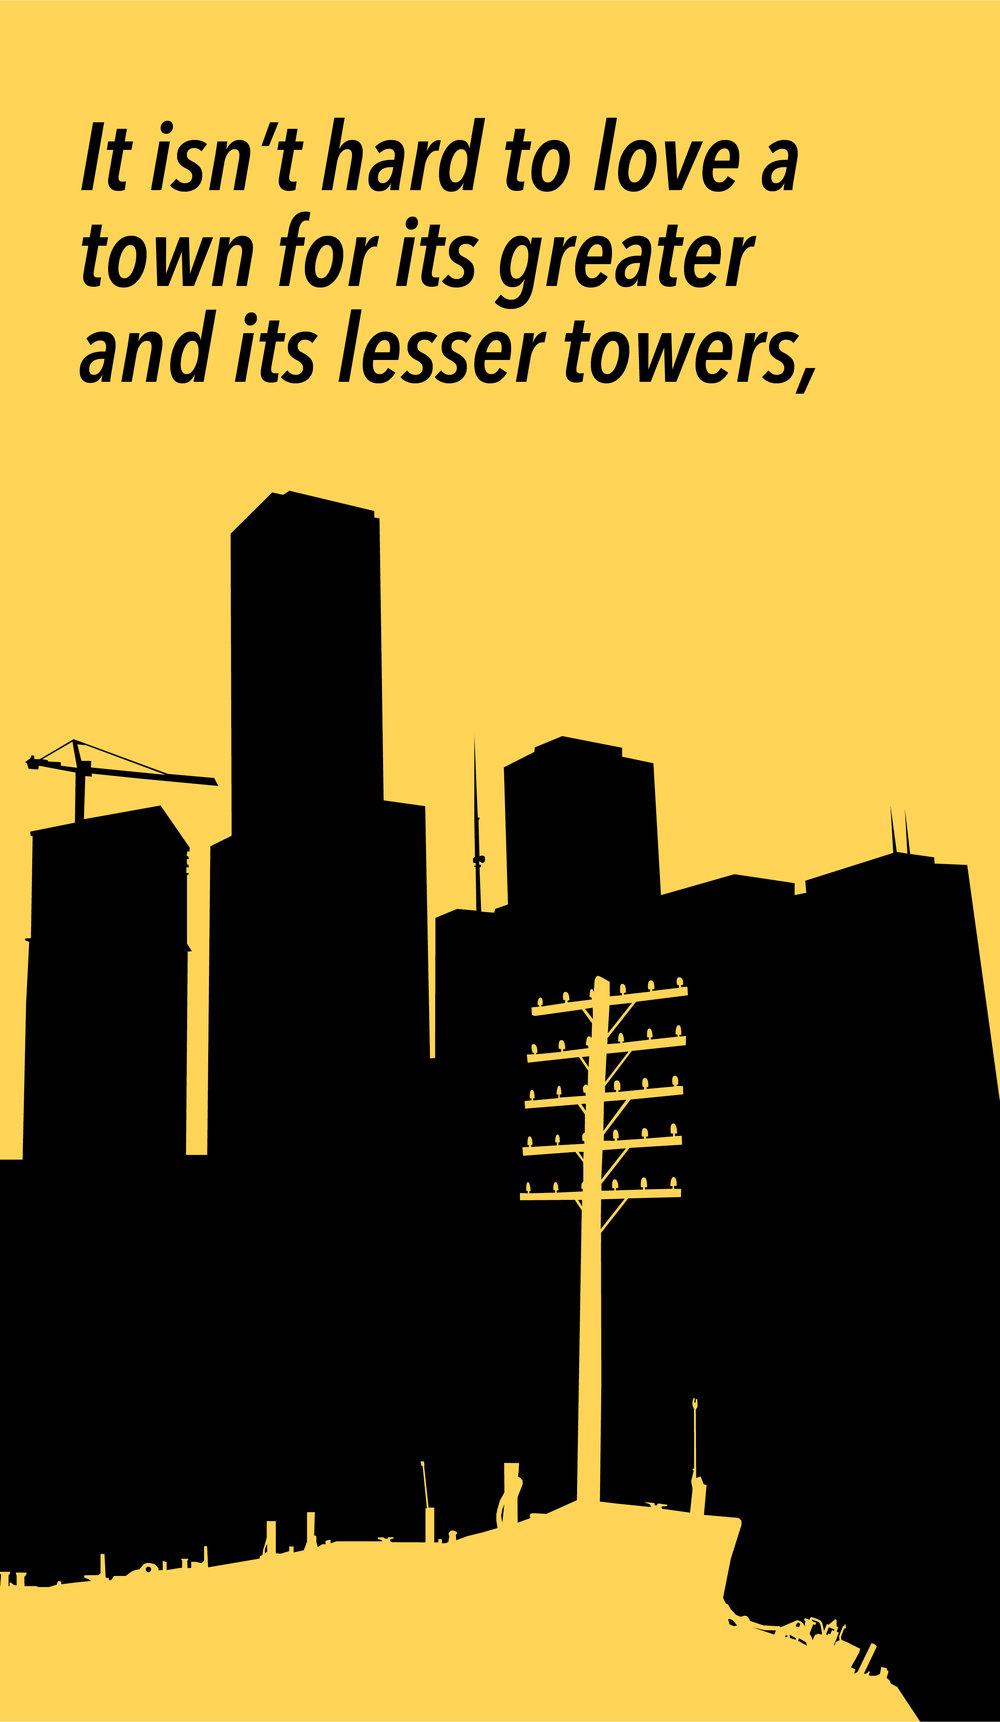 City On The Make - Storyboard - 01.25.1716.jpg